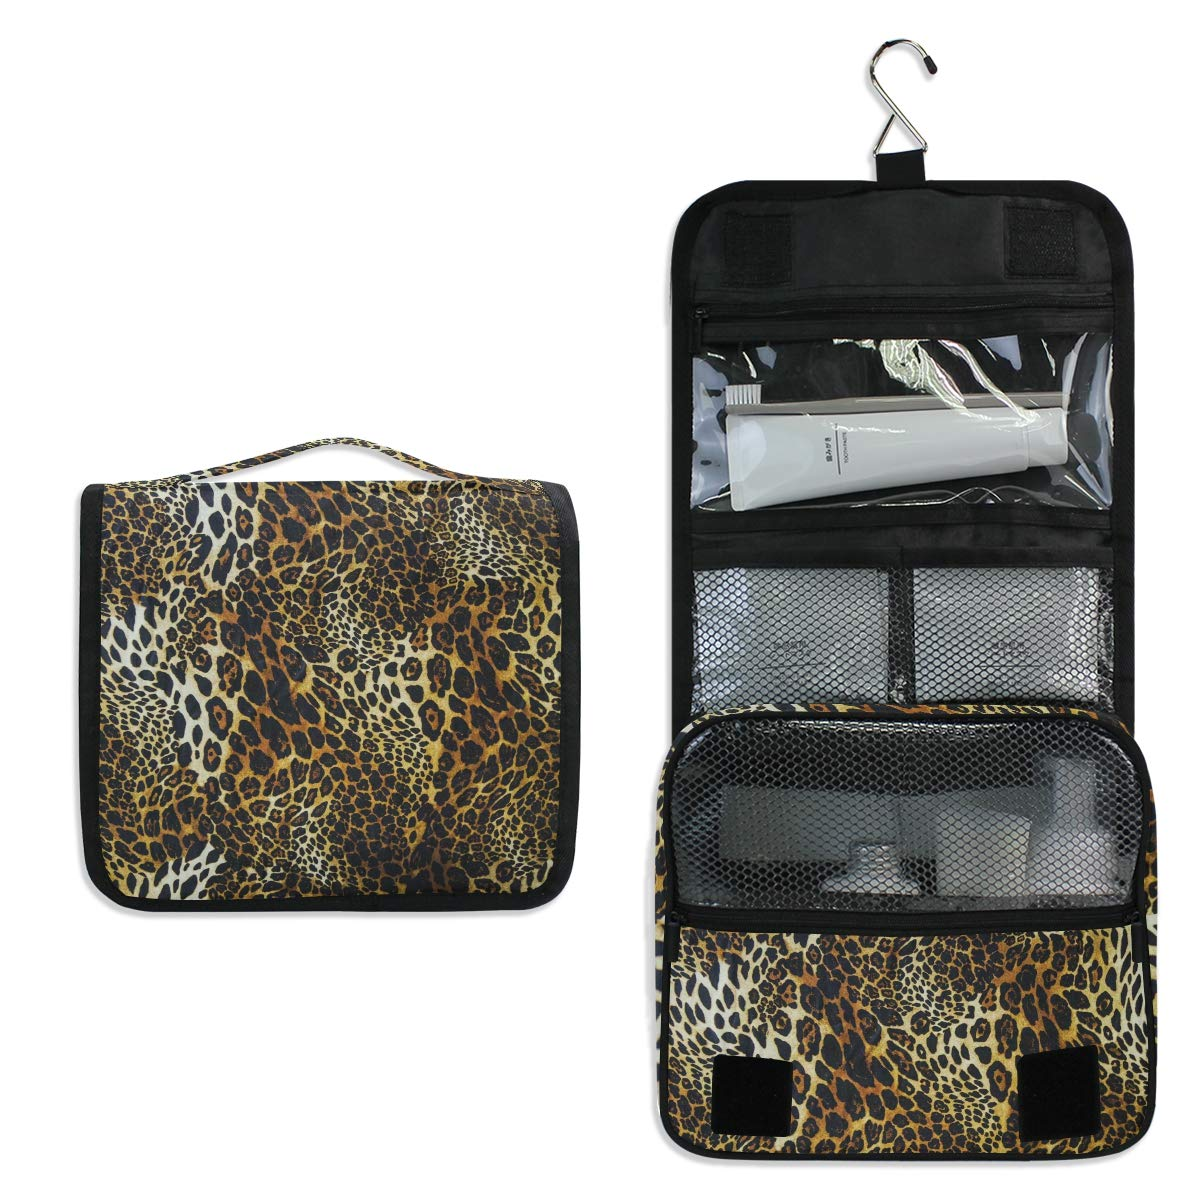 AUUXVA Hanging Toiletry Bag Animal Leopard Print Travel Cosmetics Bag Portable Toiletry Kit for Women Men